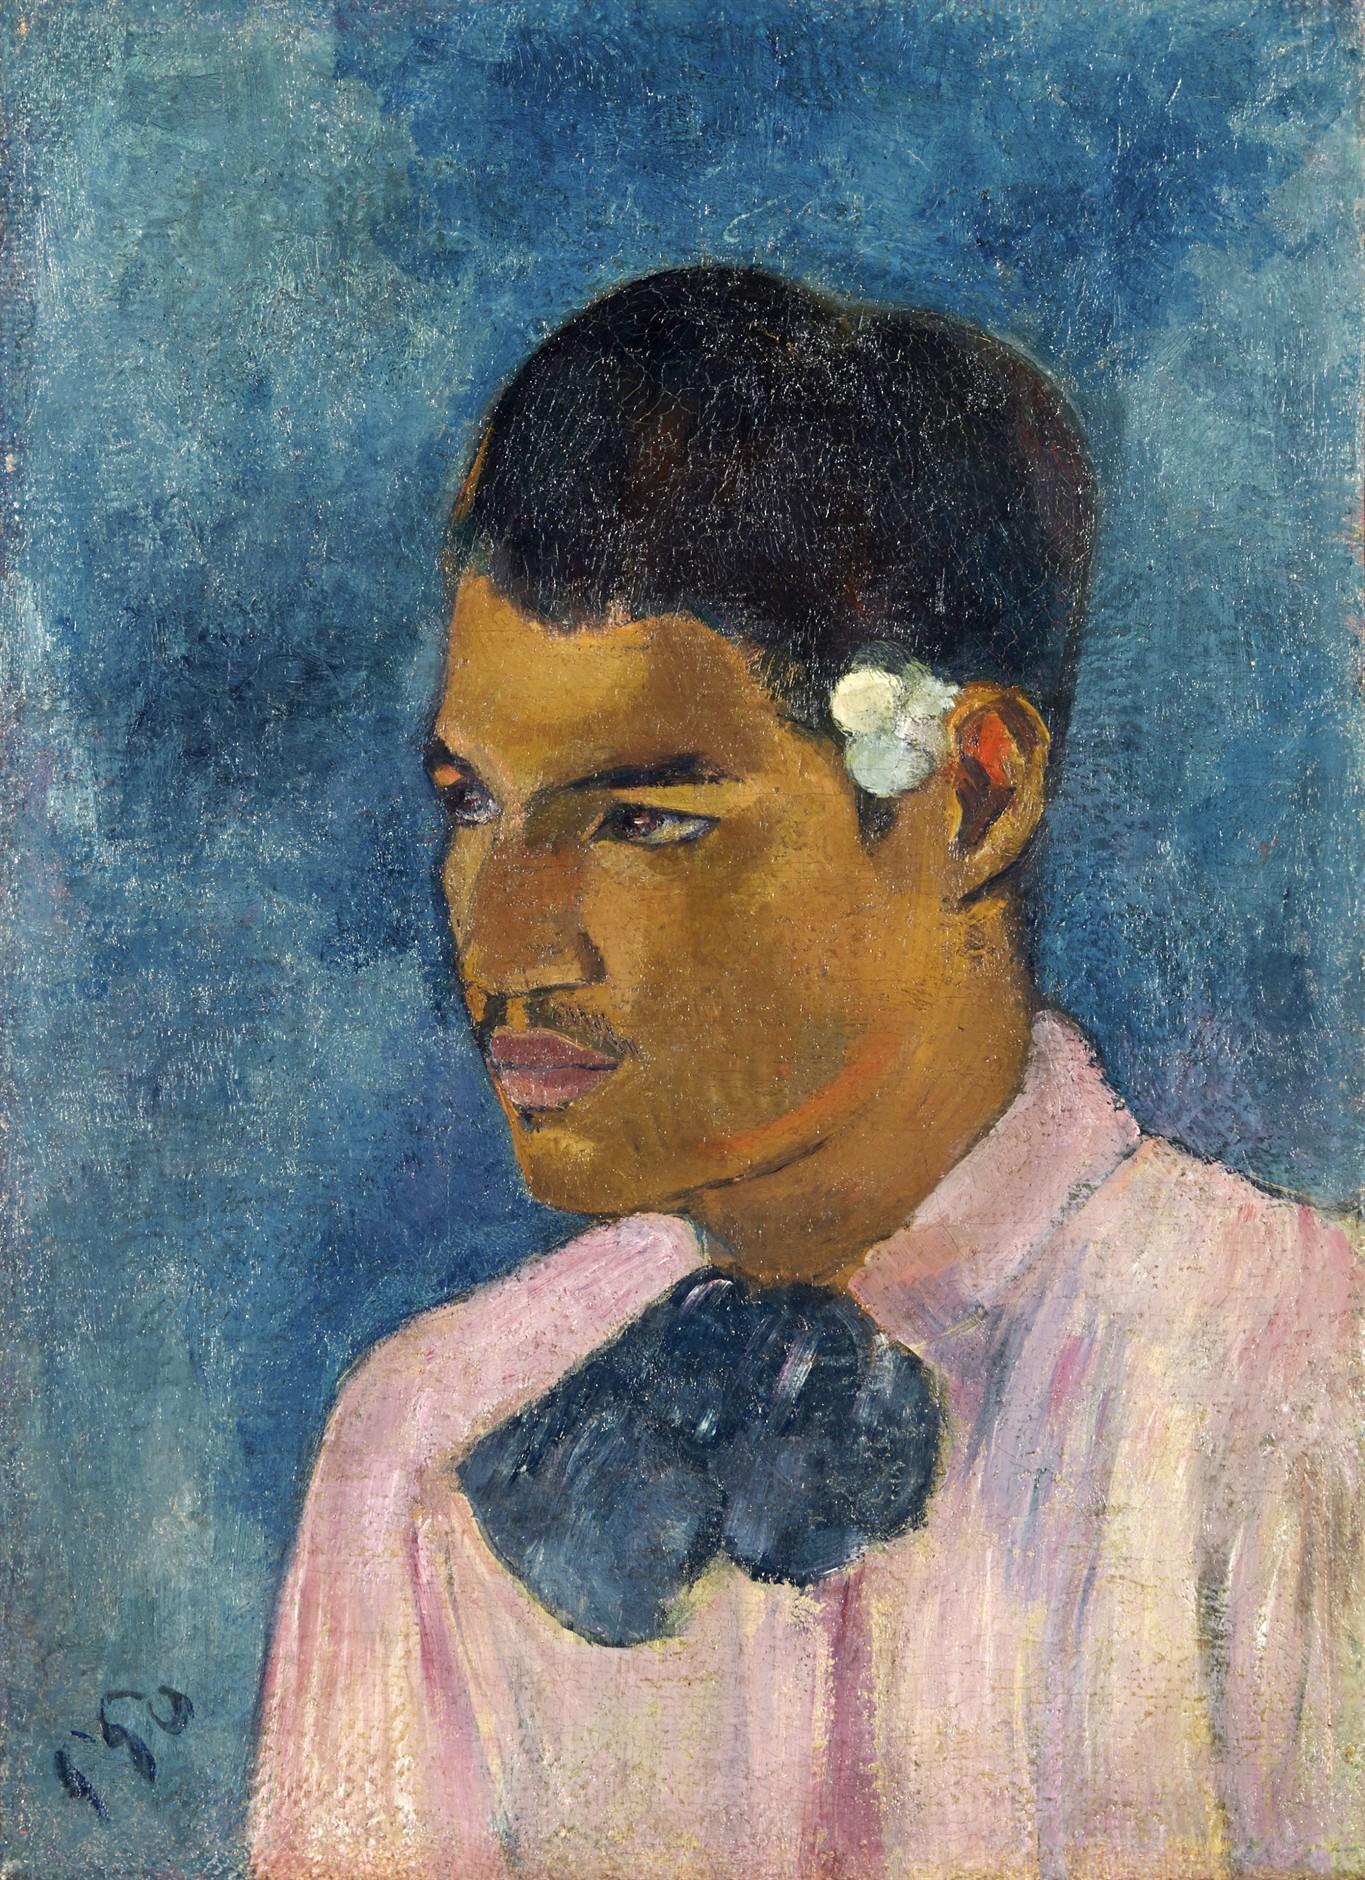 Picasso and gauguin